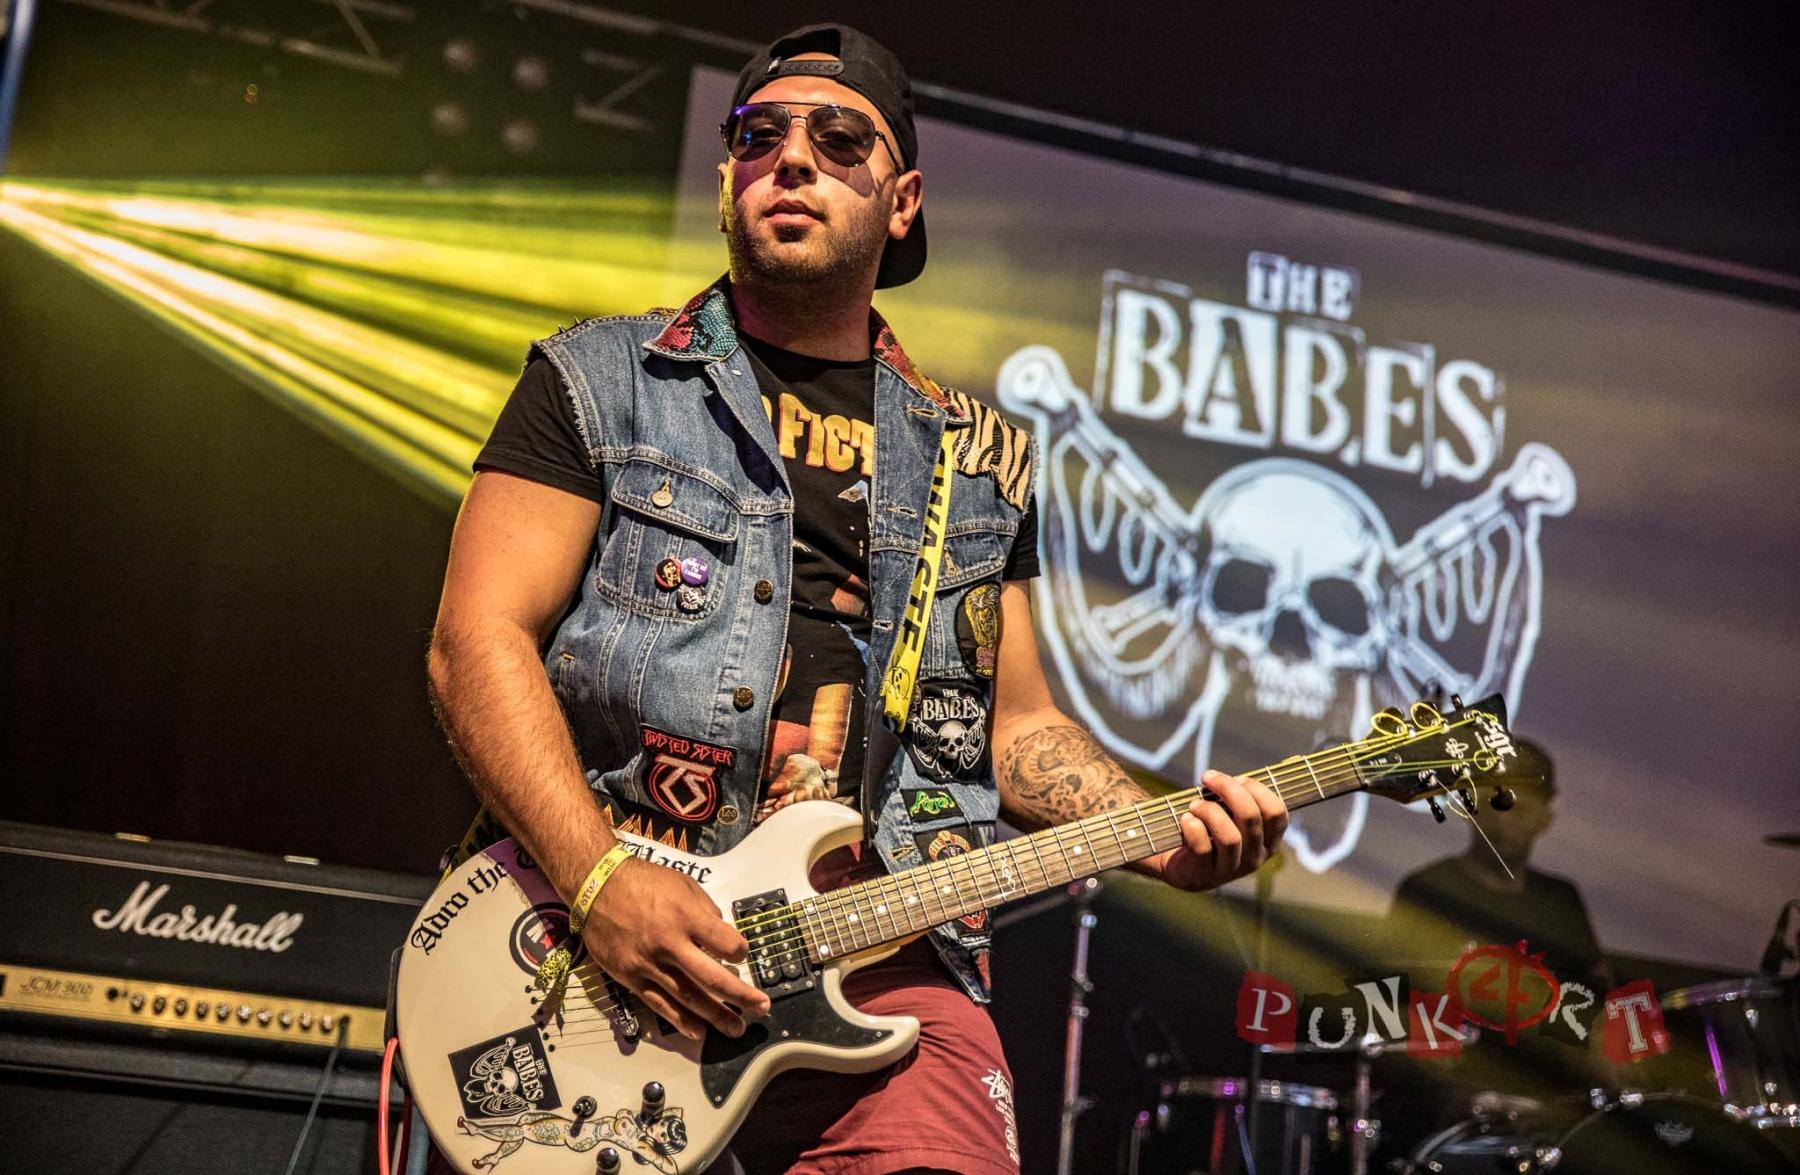 TheBabes-2